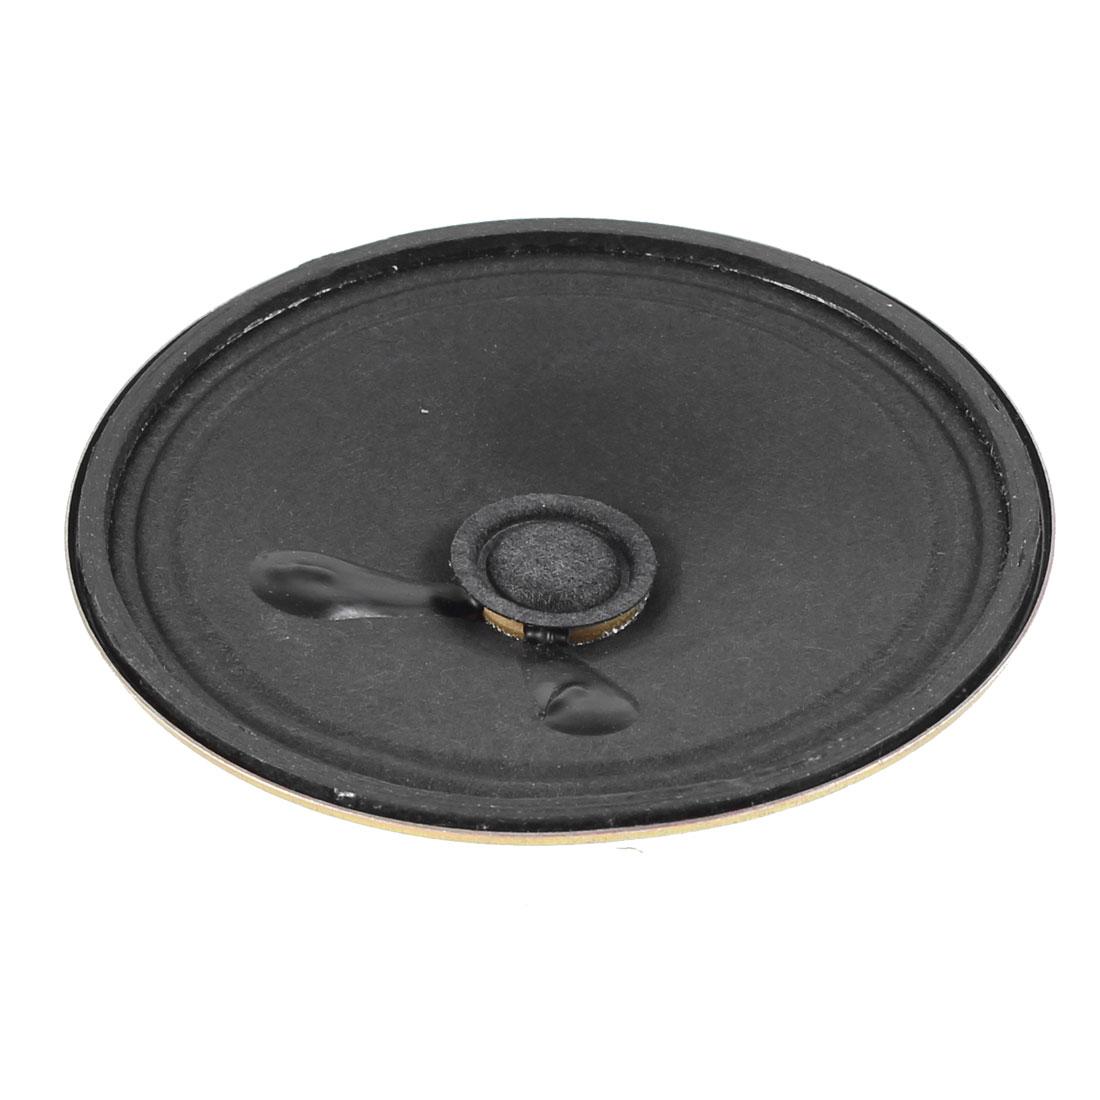 8 Ohm 2W 77mm OD Metal Shell Toys Interphone Internal Magnet Speaker